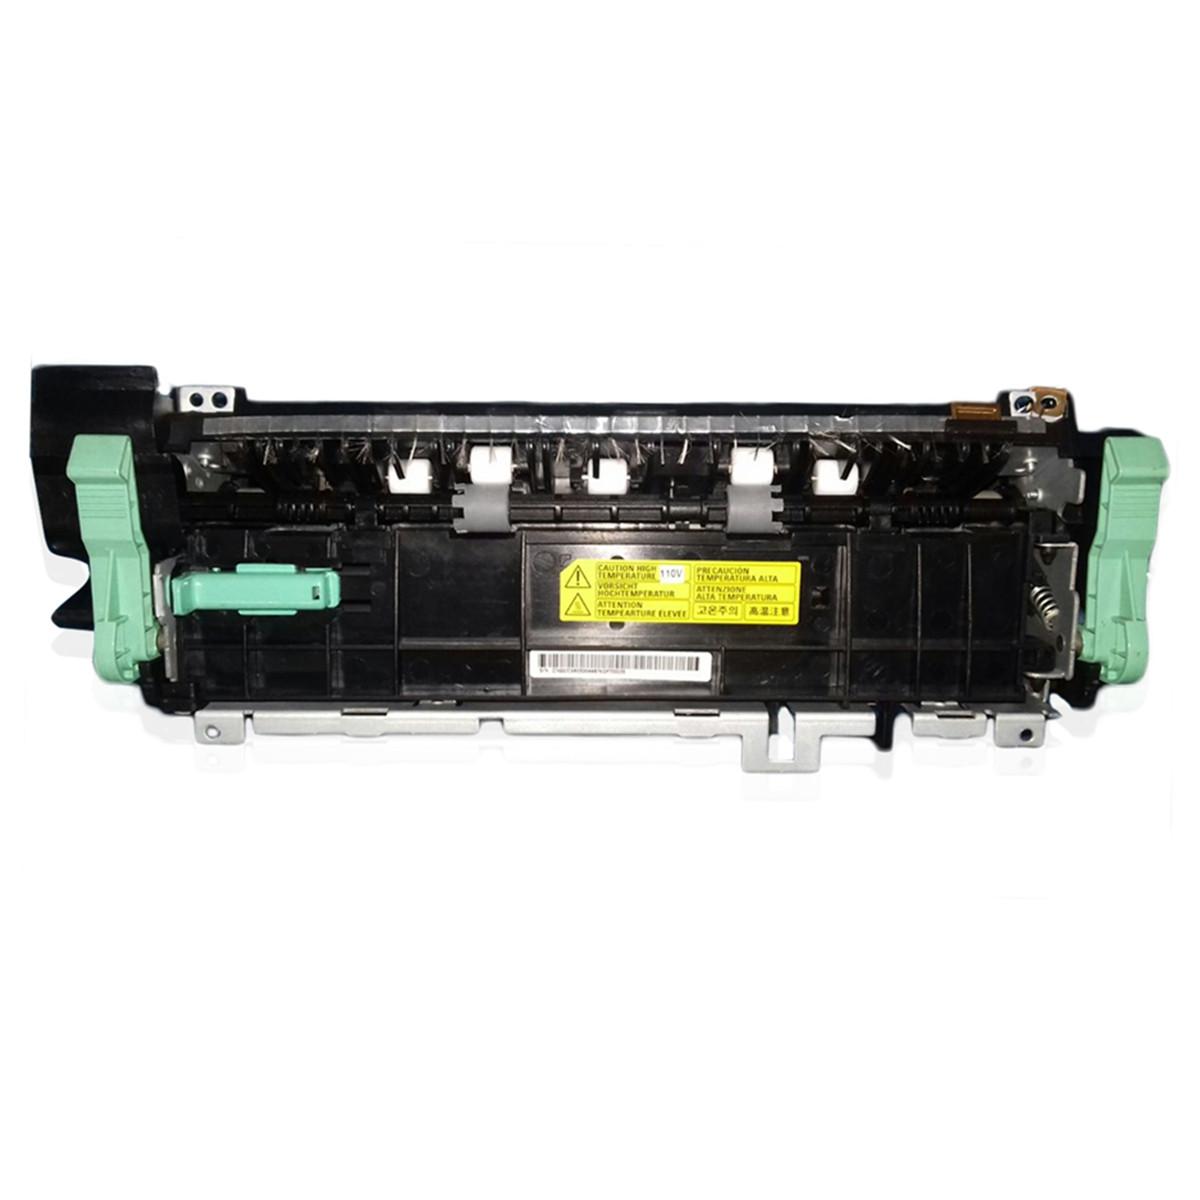 Unidade Fusora Samsung SCX5835 SCX5835FN SCX5935FN SCX 5835 5835FN 5935FN | JC91-00925D | Original